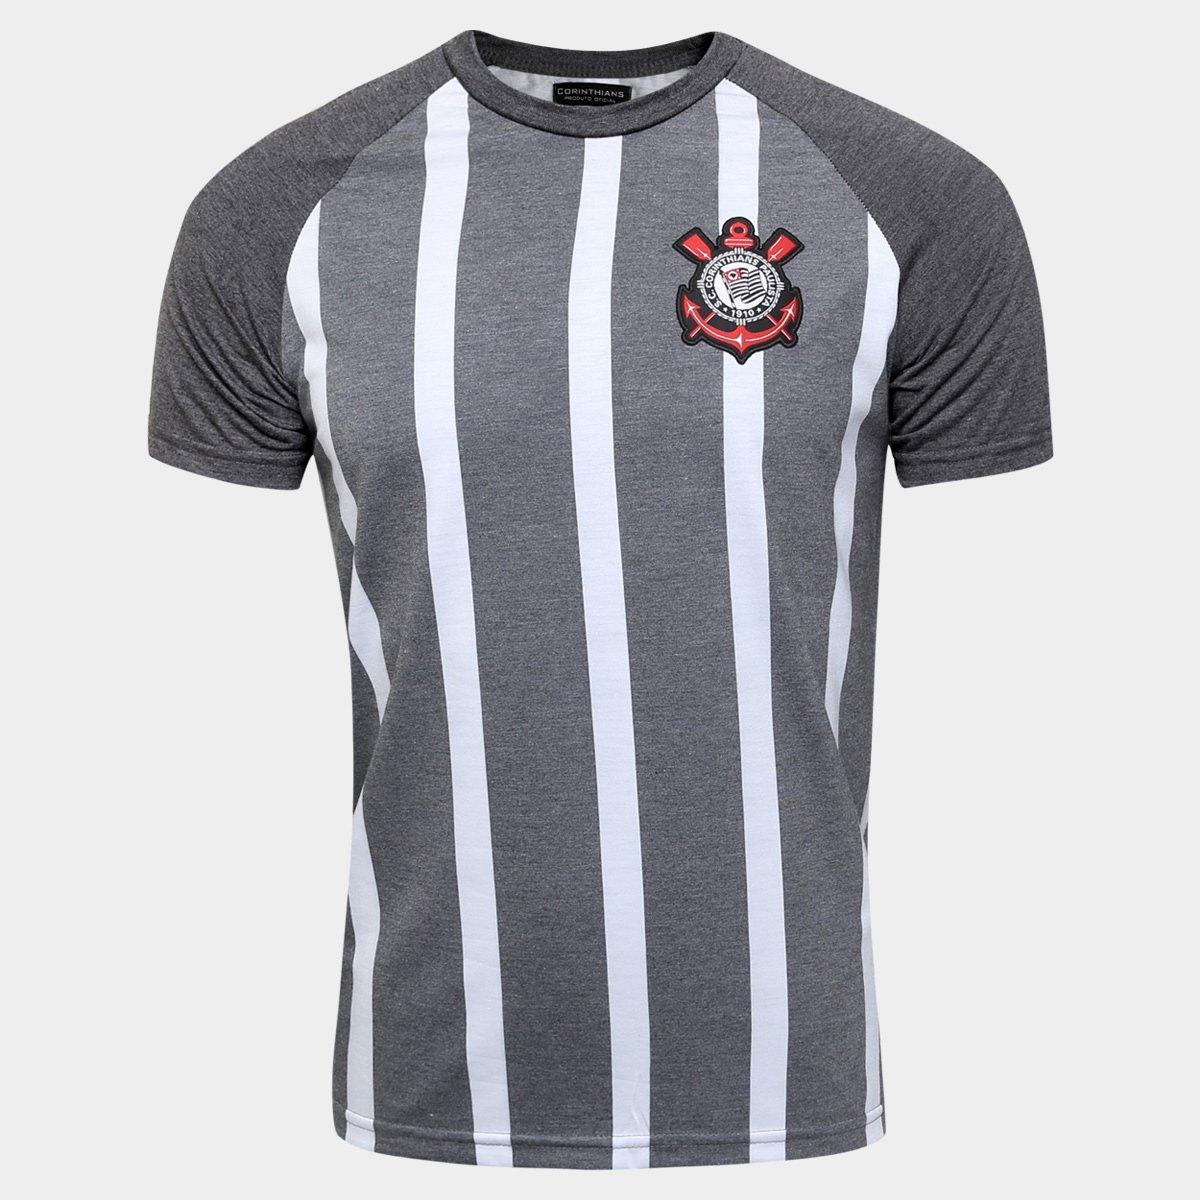 b155a1c719350 Camisa Corinthians Retrô Torcedor Masculina - Compre Agora